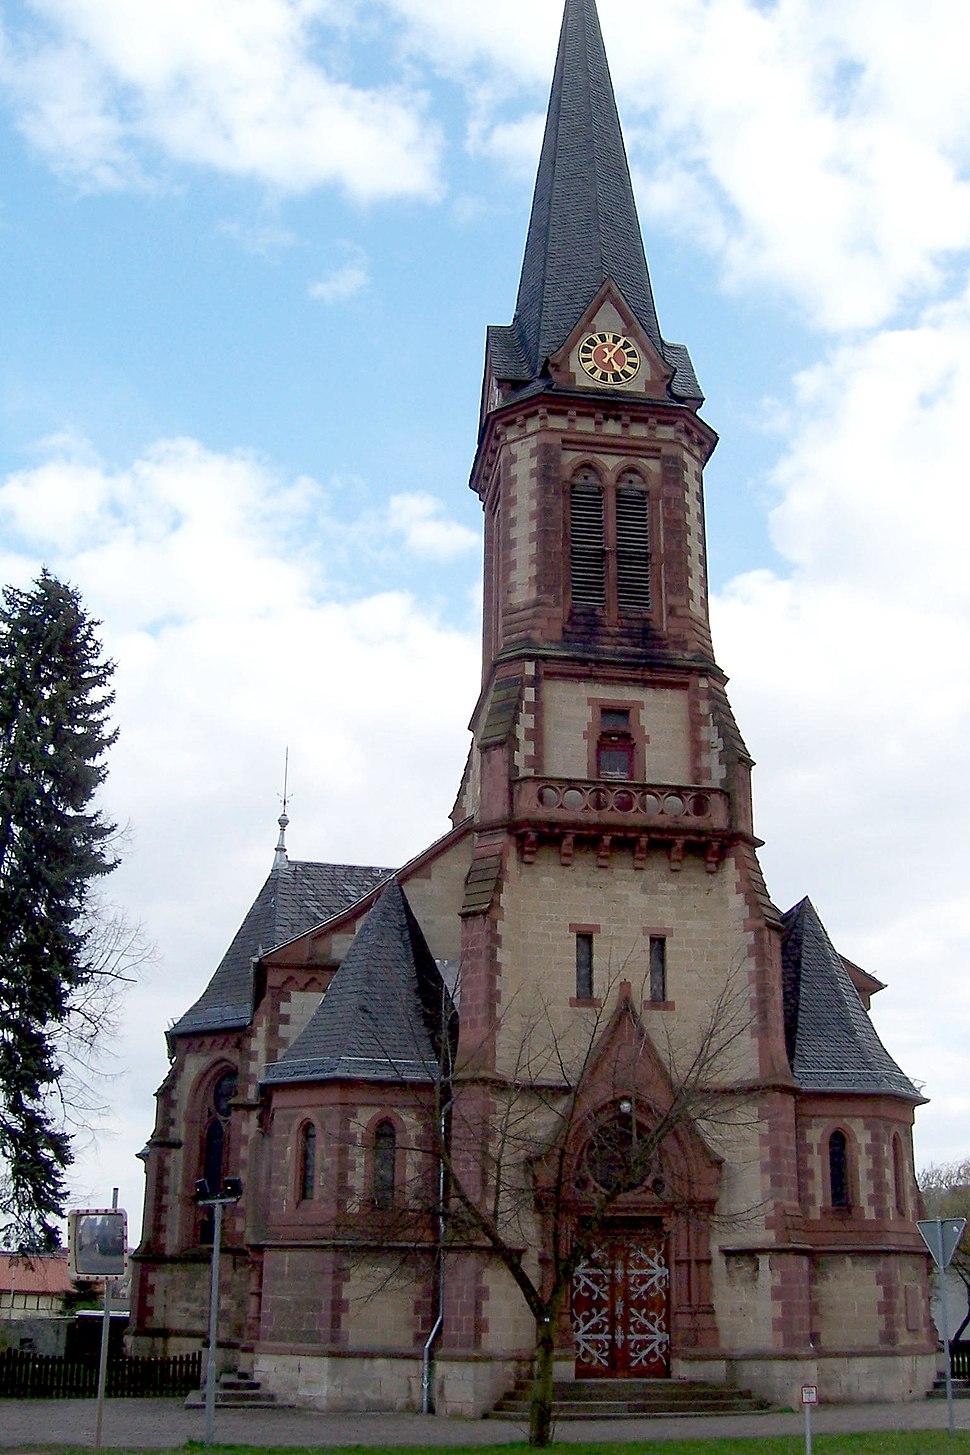 Kirche St. Matthias Stockhausen (Sondershausen)